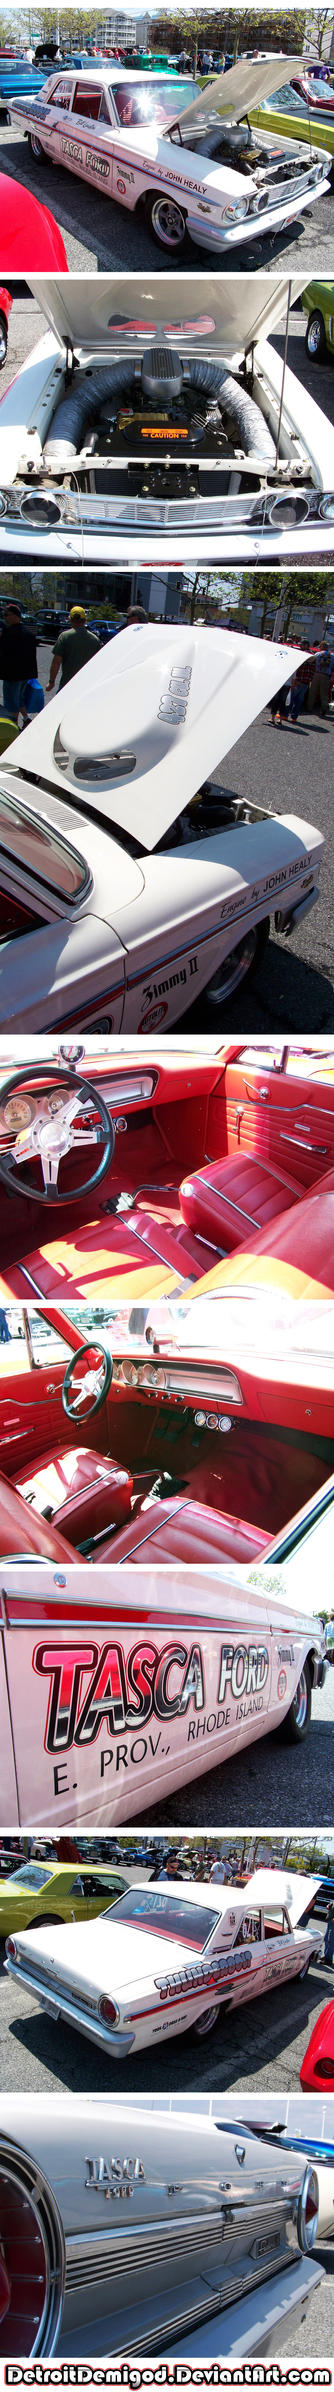 '64 Tasca Tribute_Ref Sheet by DetroitDemigod